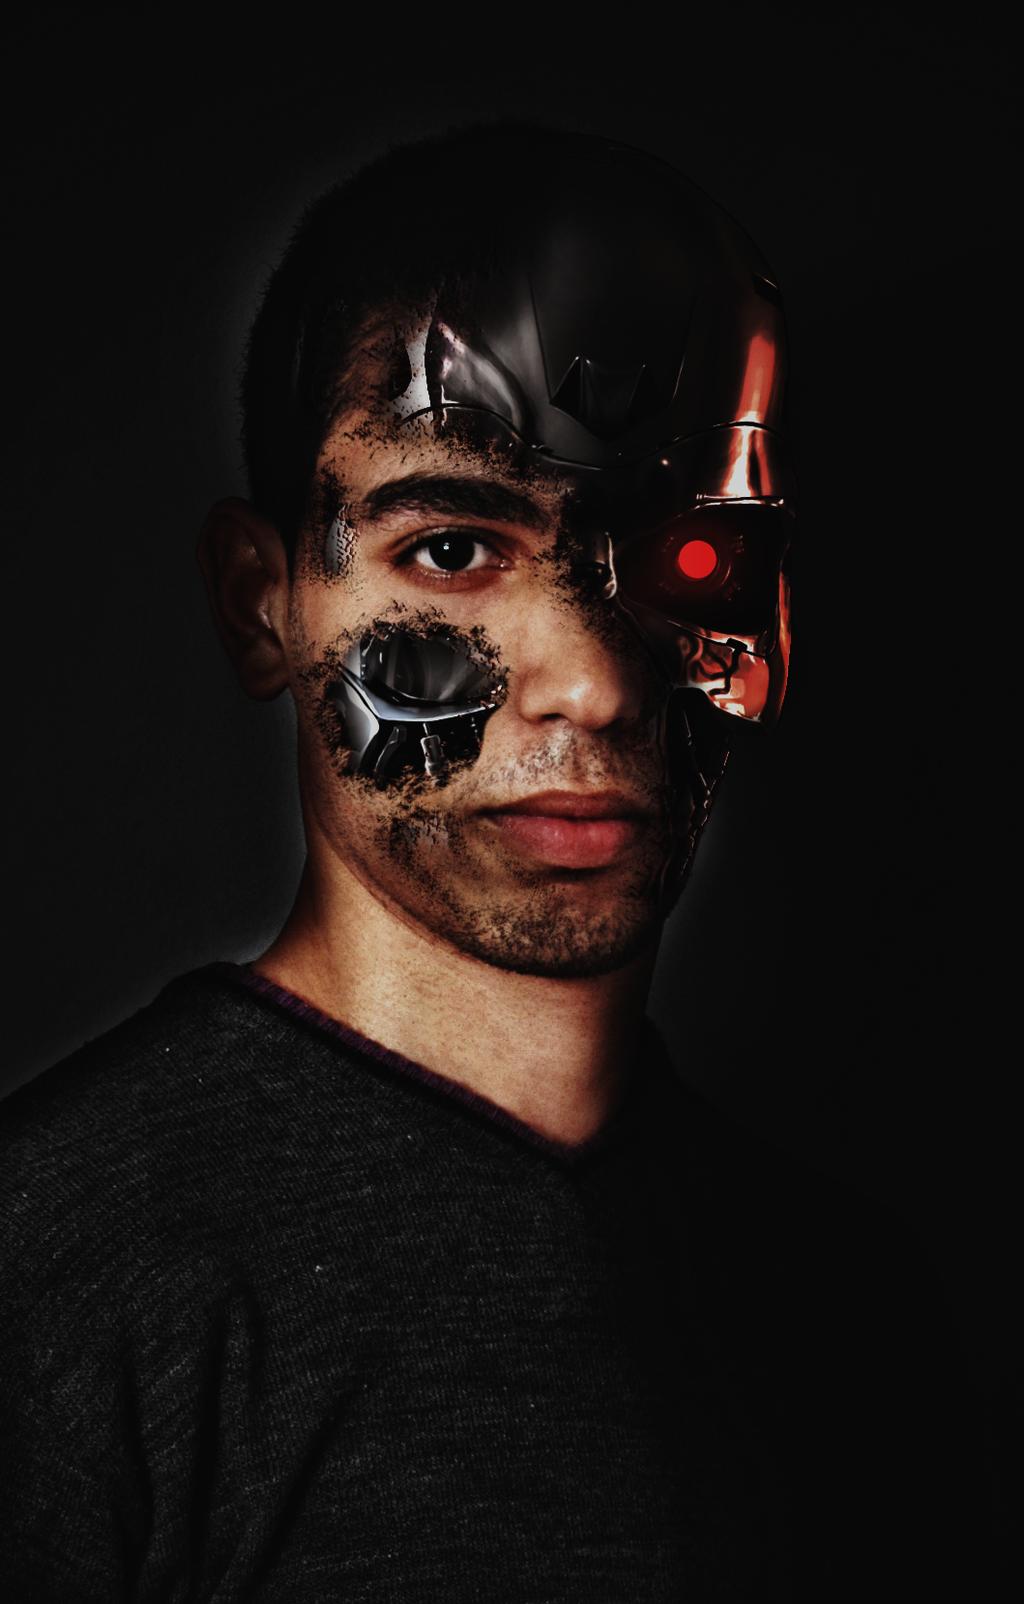 Terminator face by WeeZi01 on DeviantArt